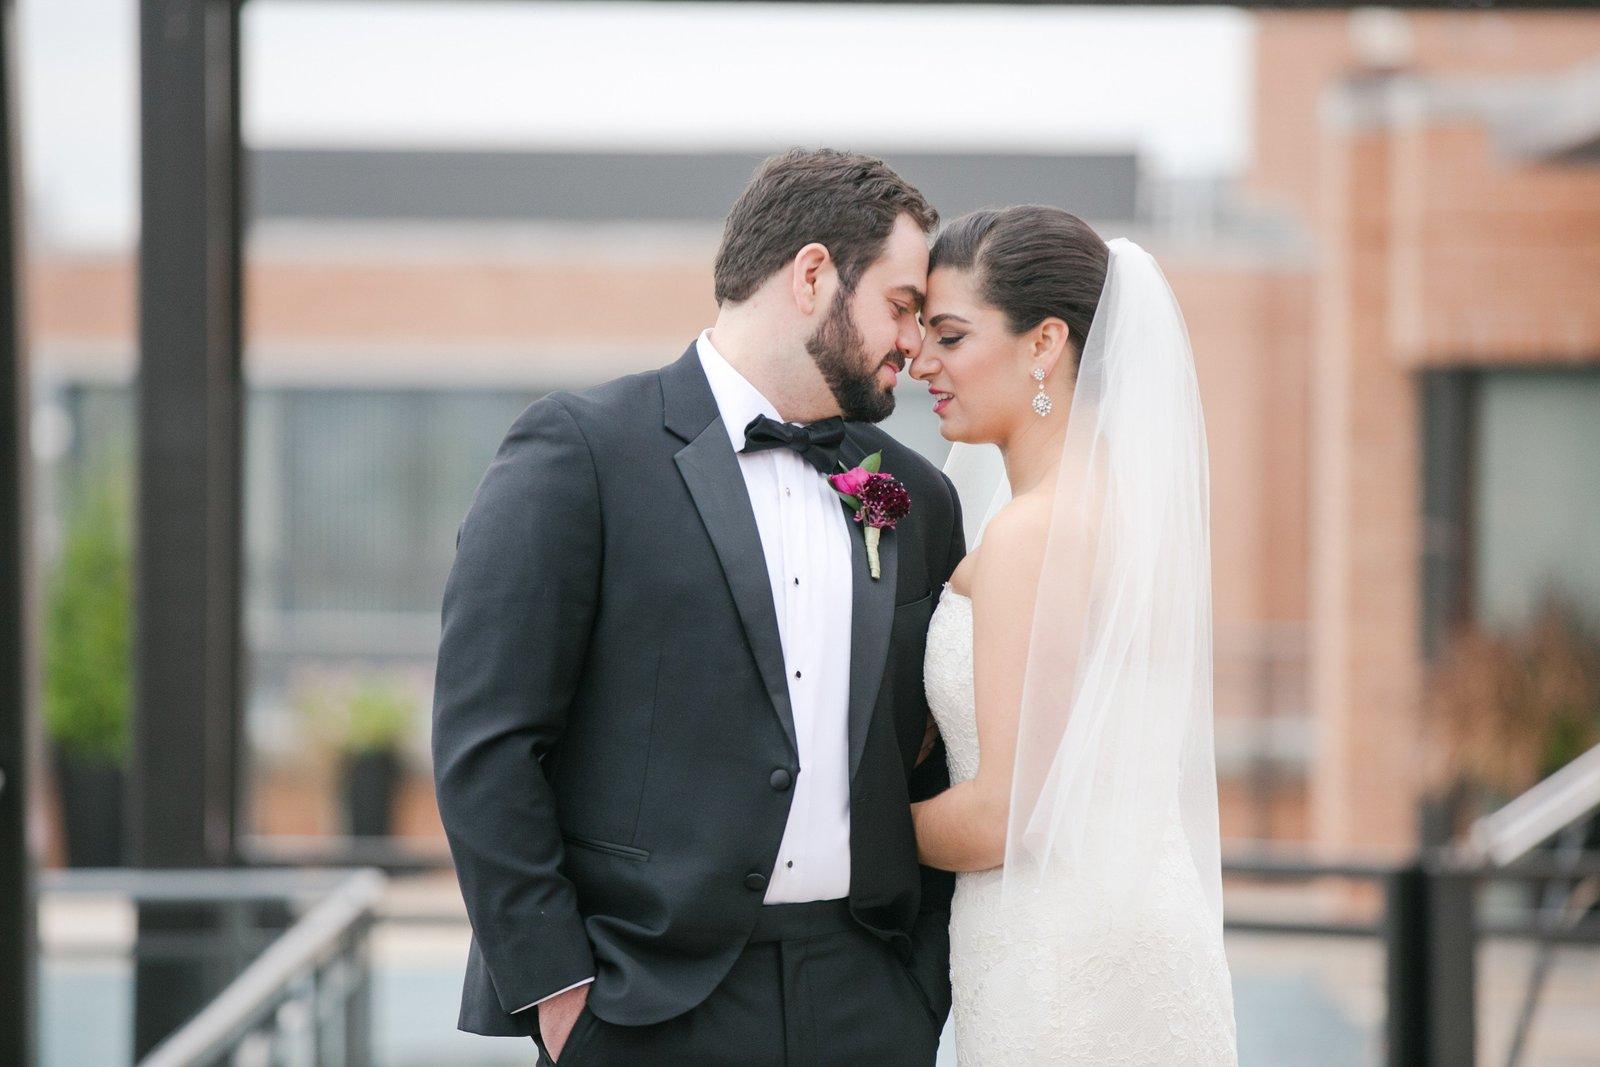 Black-tie-wedding-photos-longview-gallery-dc (145)